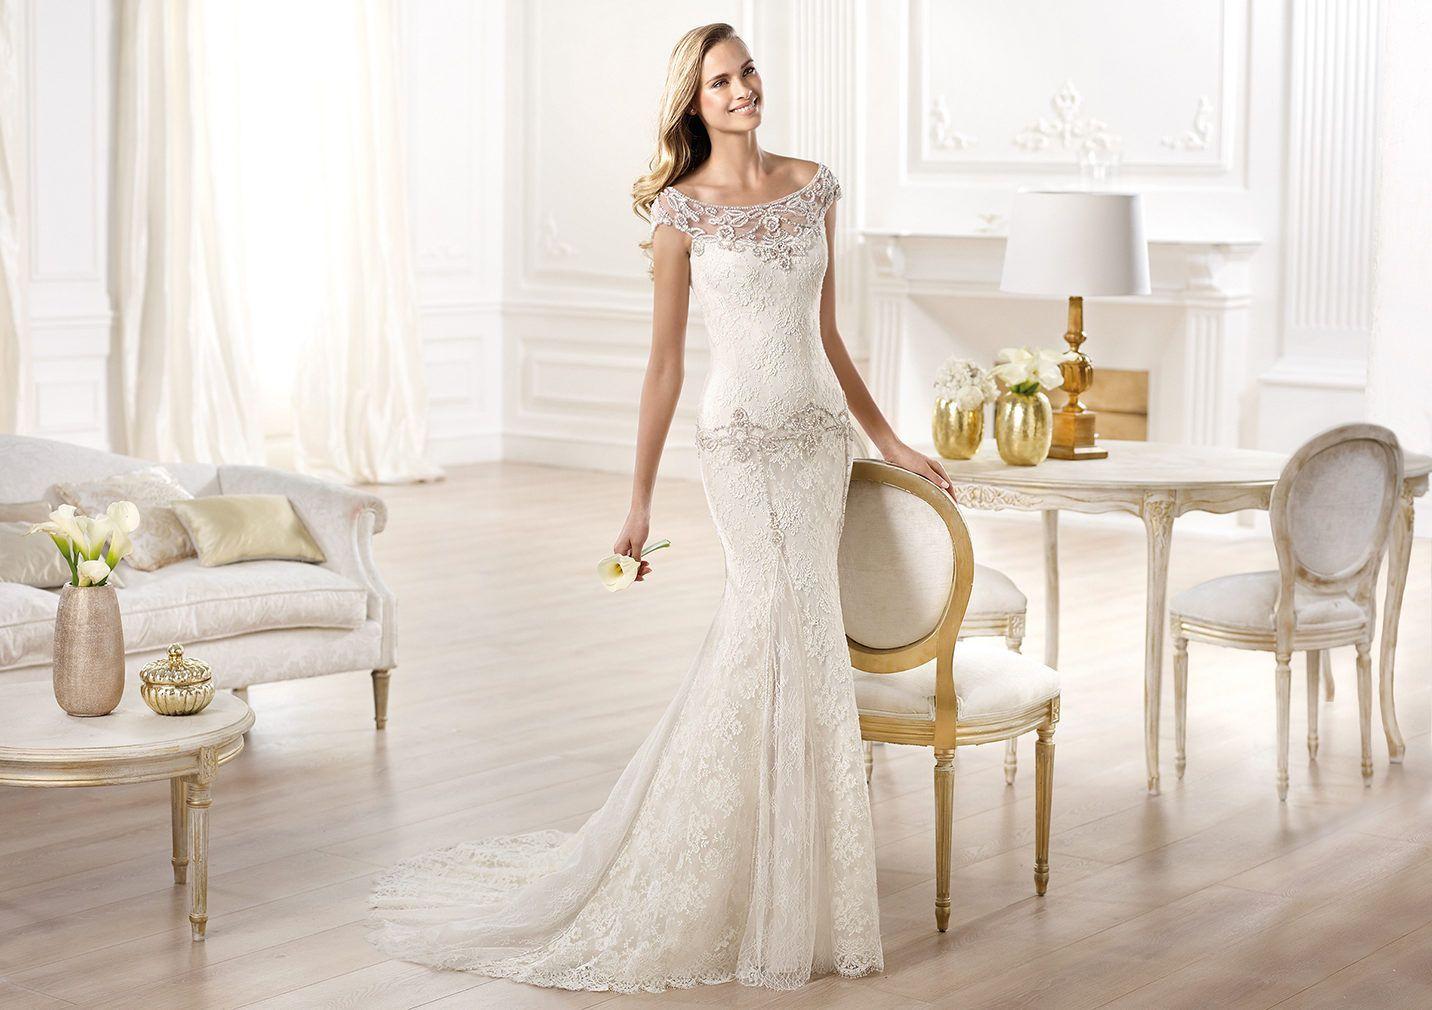 Yalena wedding dress dresses pinterest wedding dresses